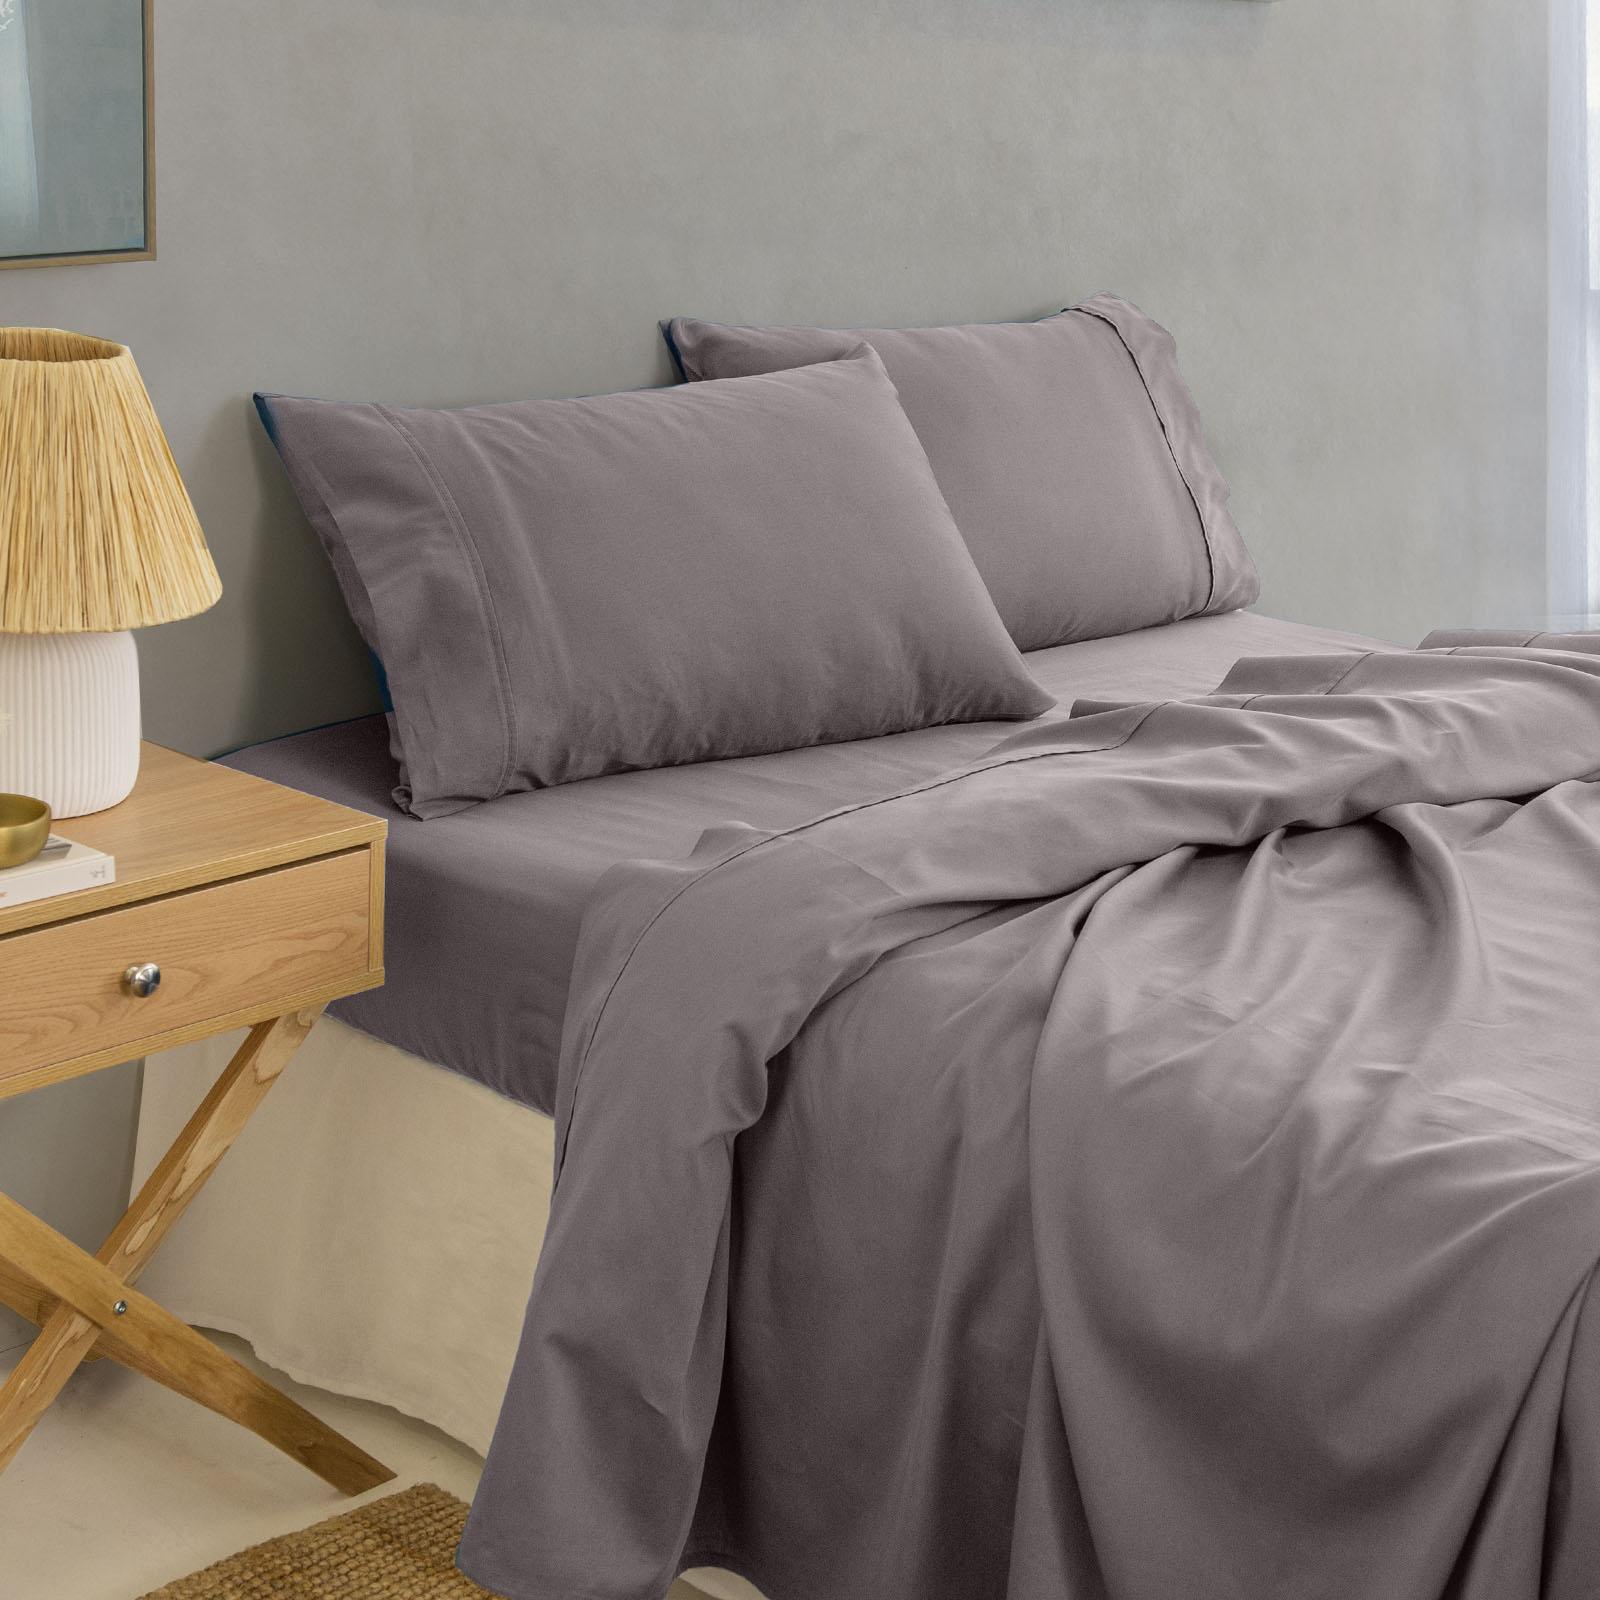 thumbnail 47 - Royal Comfort 1000TC Hotel Grade Bamboo Cotton Sheets Pillowcases Set Ultrasoft